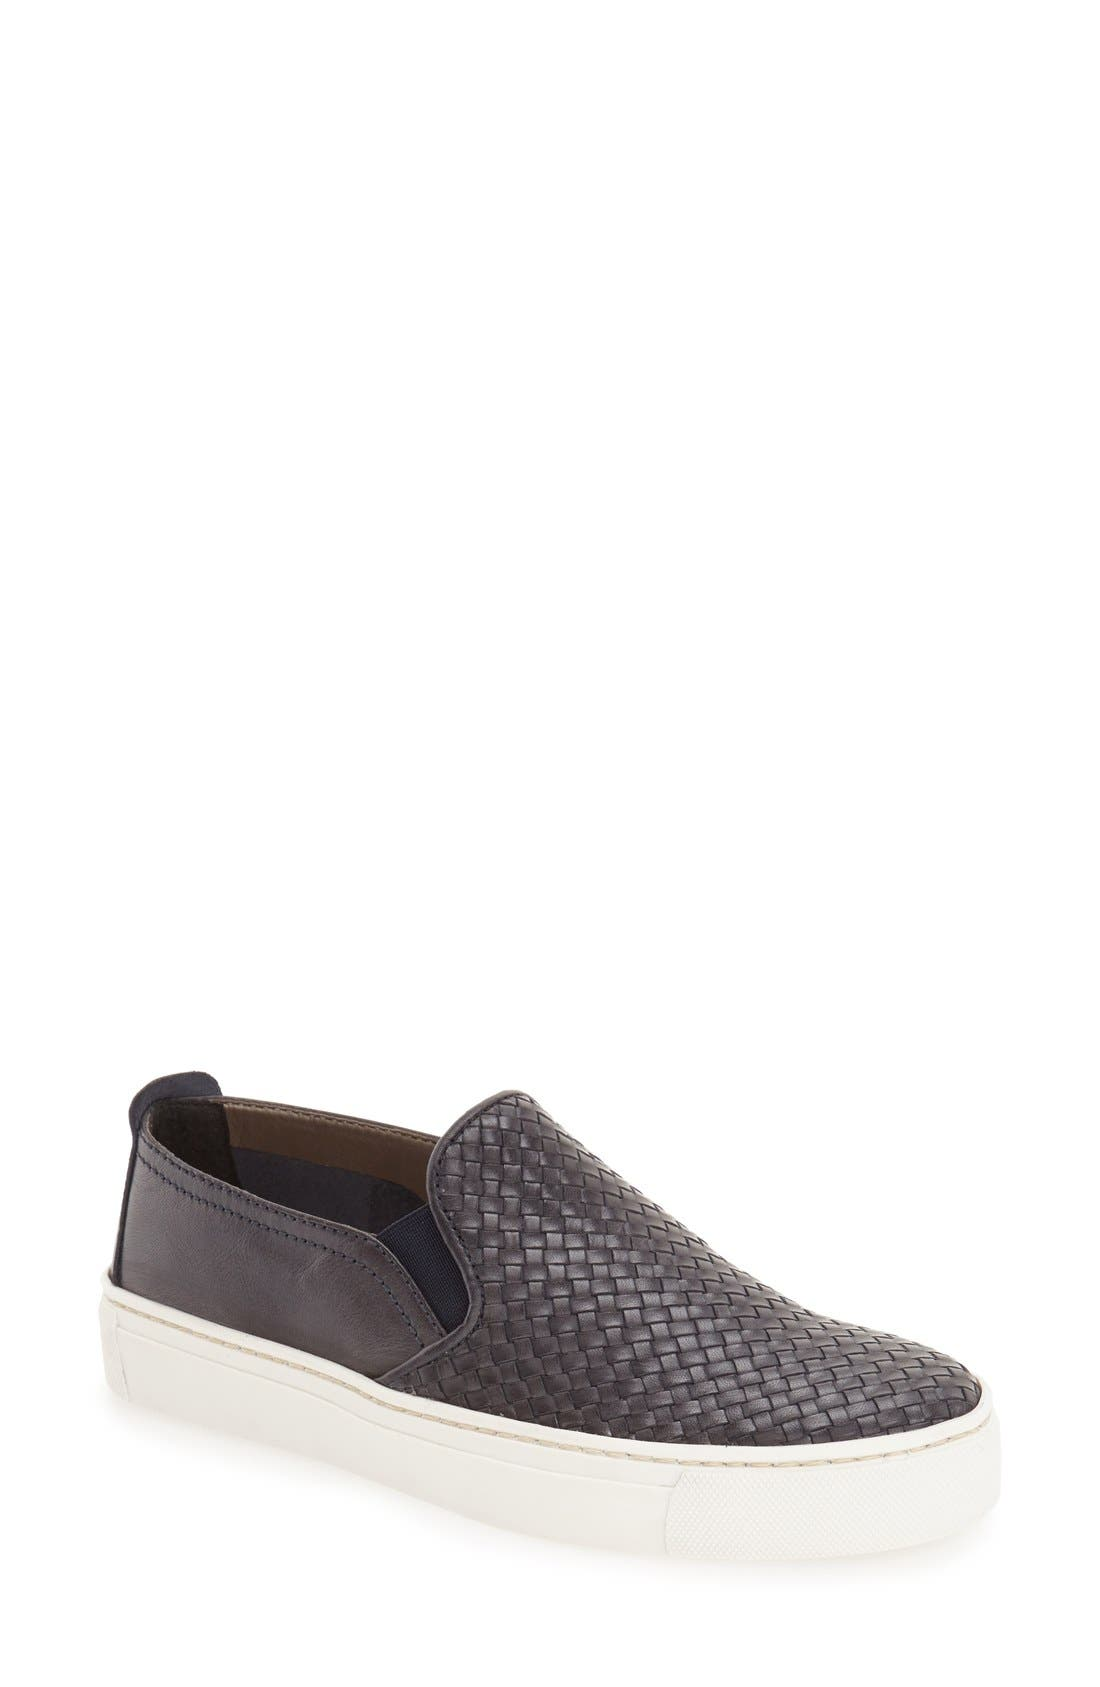 'Sneak Name' Sneaker,                             Main thumbnail 1, color,                             Navy Leather